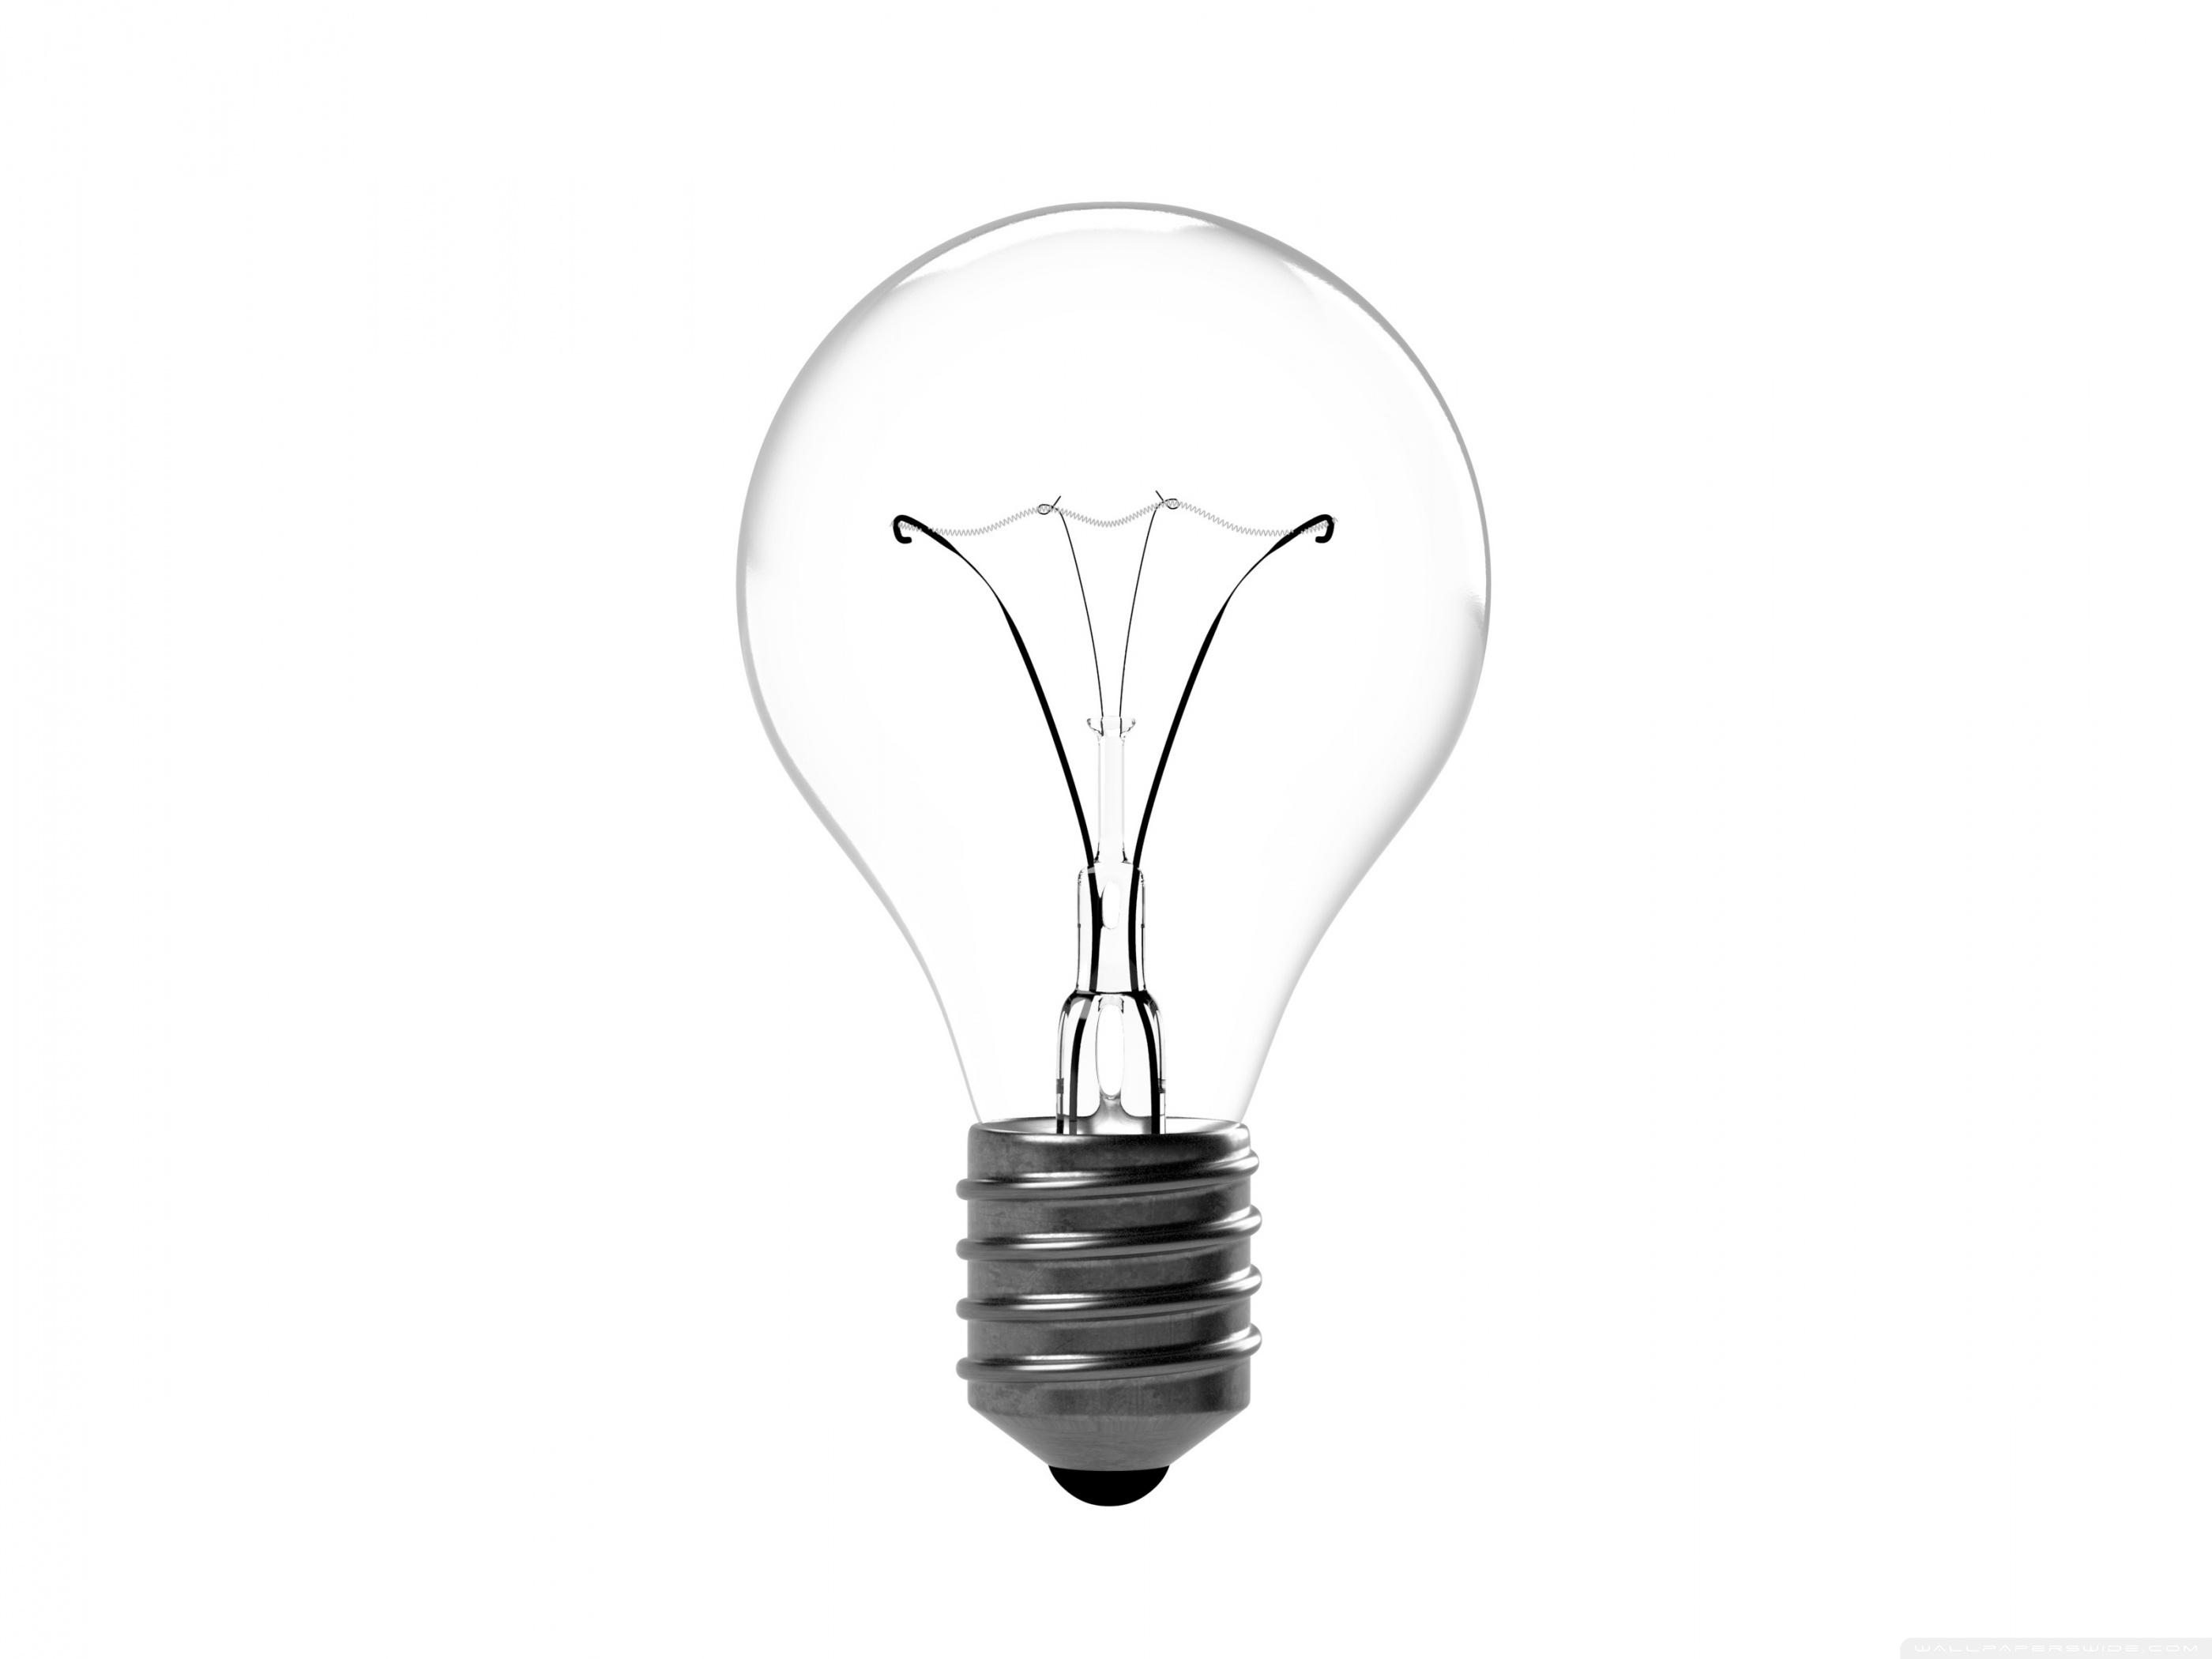 Incandescent Light Bulb 4K HD Desktop Wallpaper for 4K Ultra HD 2800x2100